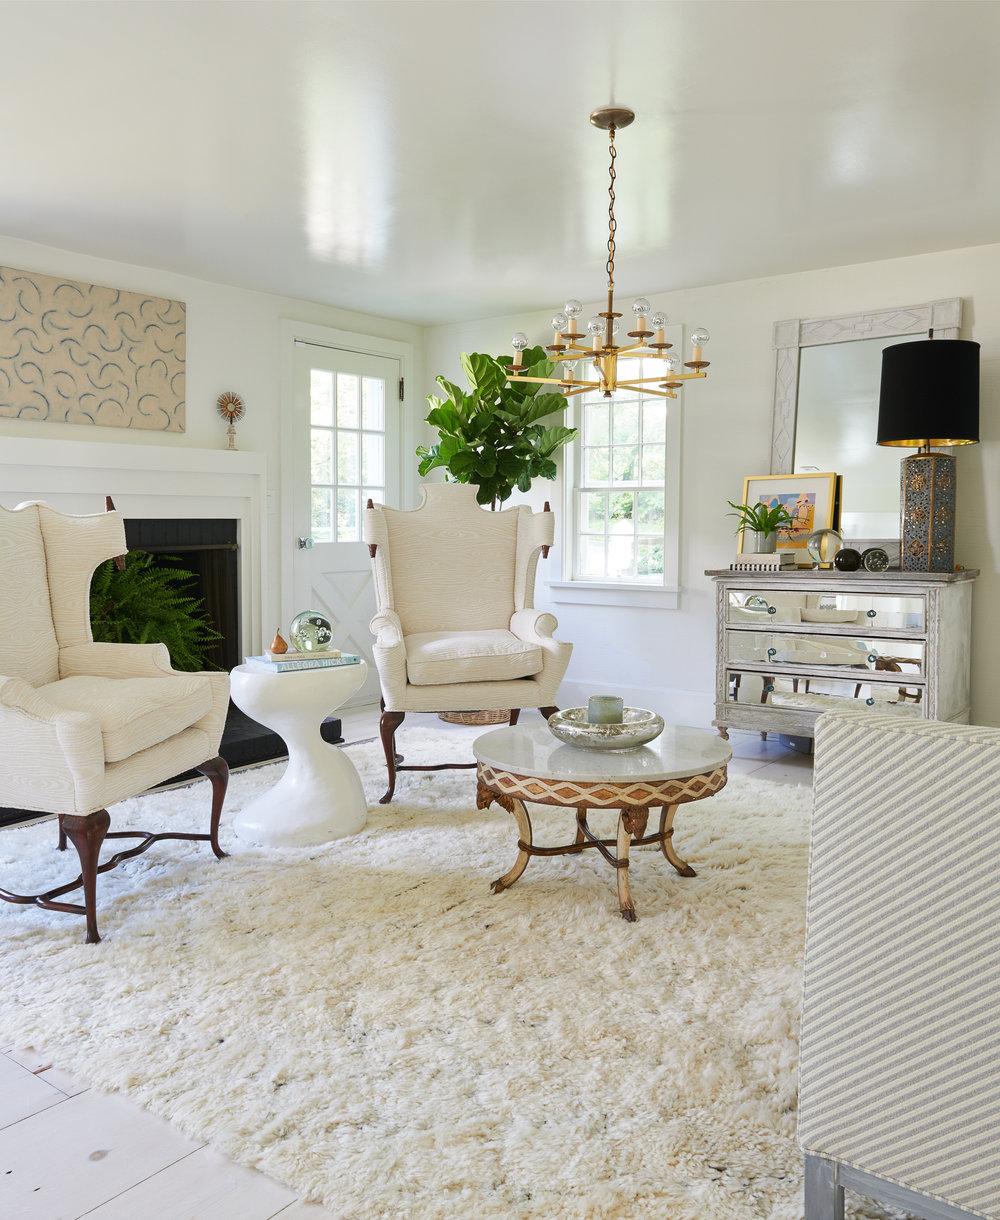 Lyon-Field-Living-room-interior-design-©Jane Beiles-18084536.jpg